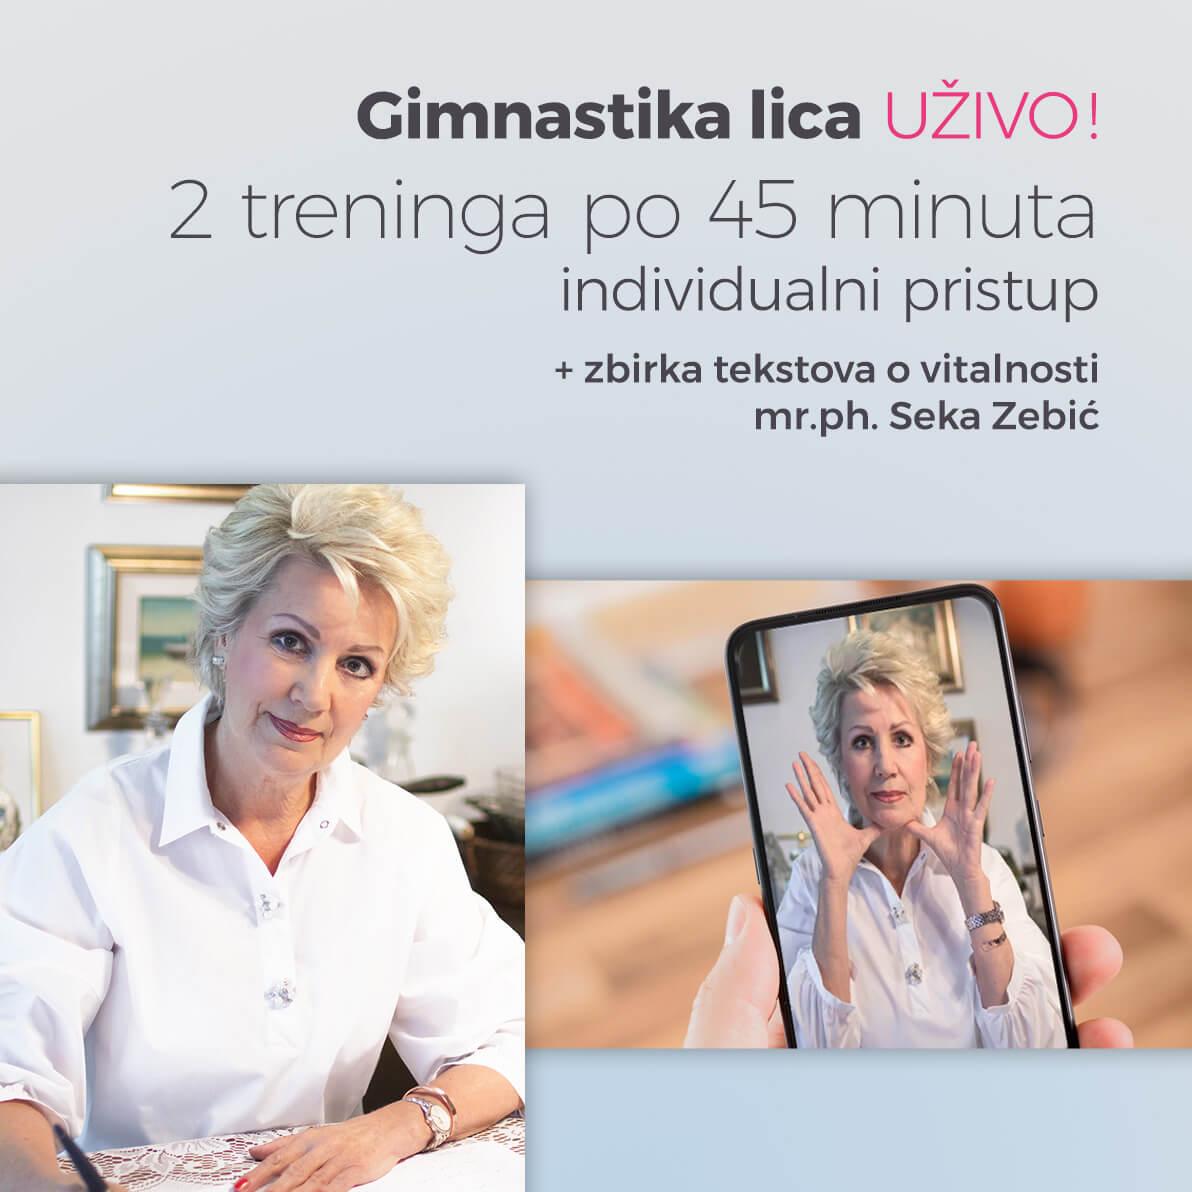 Online trening gimnastika lica